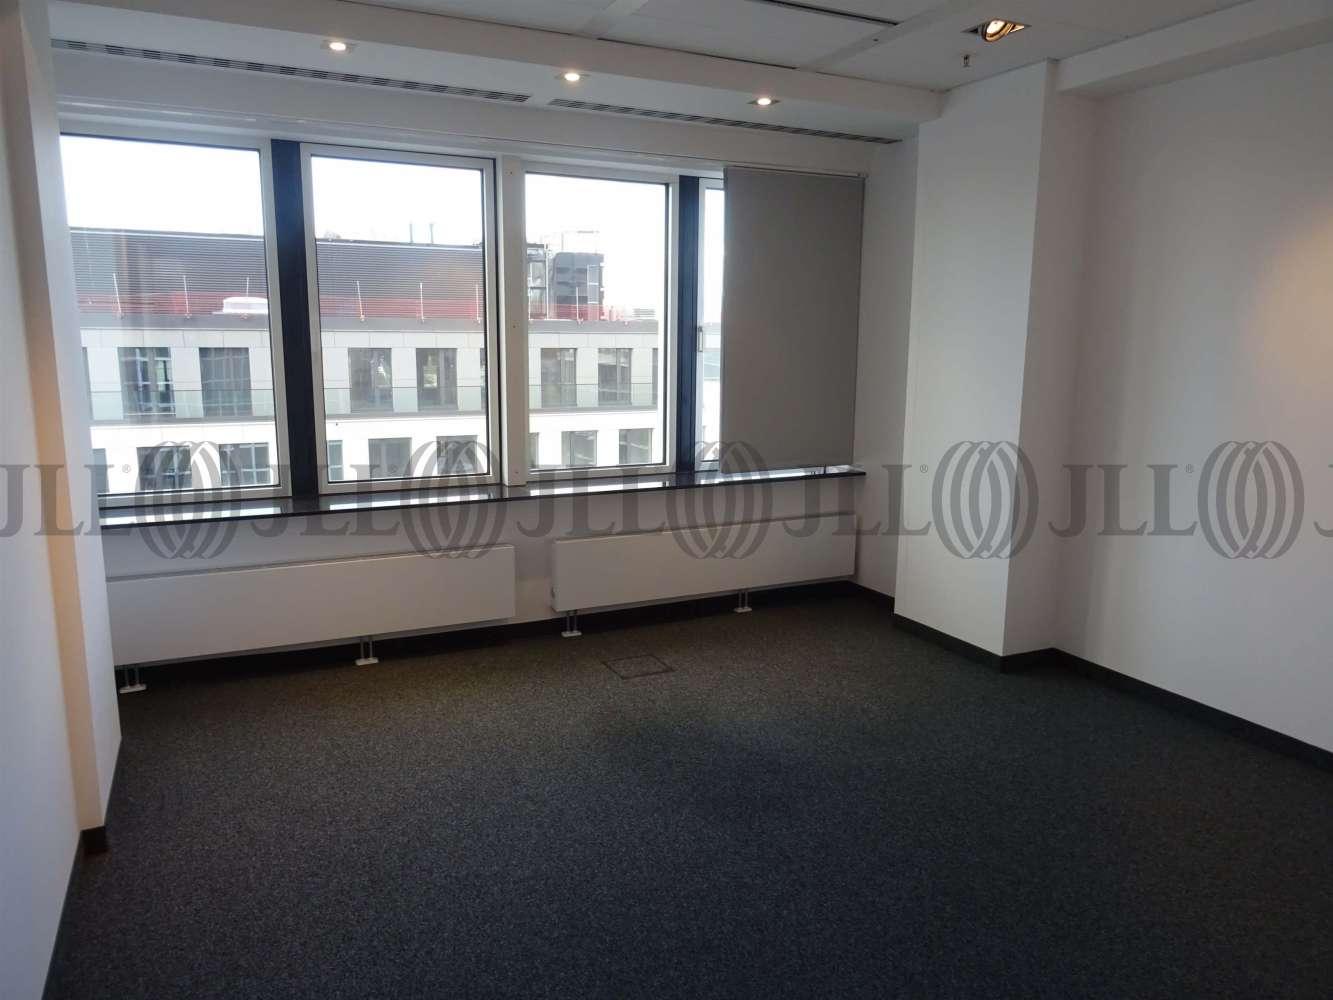 Büros Frankfurt am main, 60325 - Büro - Frankfurt am Main, Westend-Süd - D0001 - 10483408